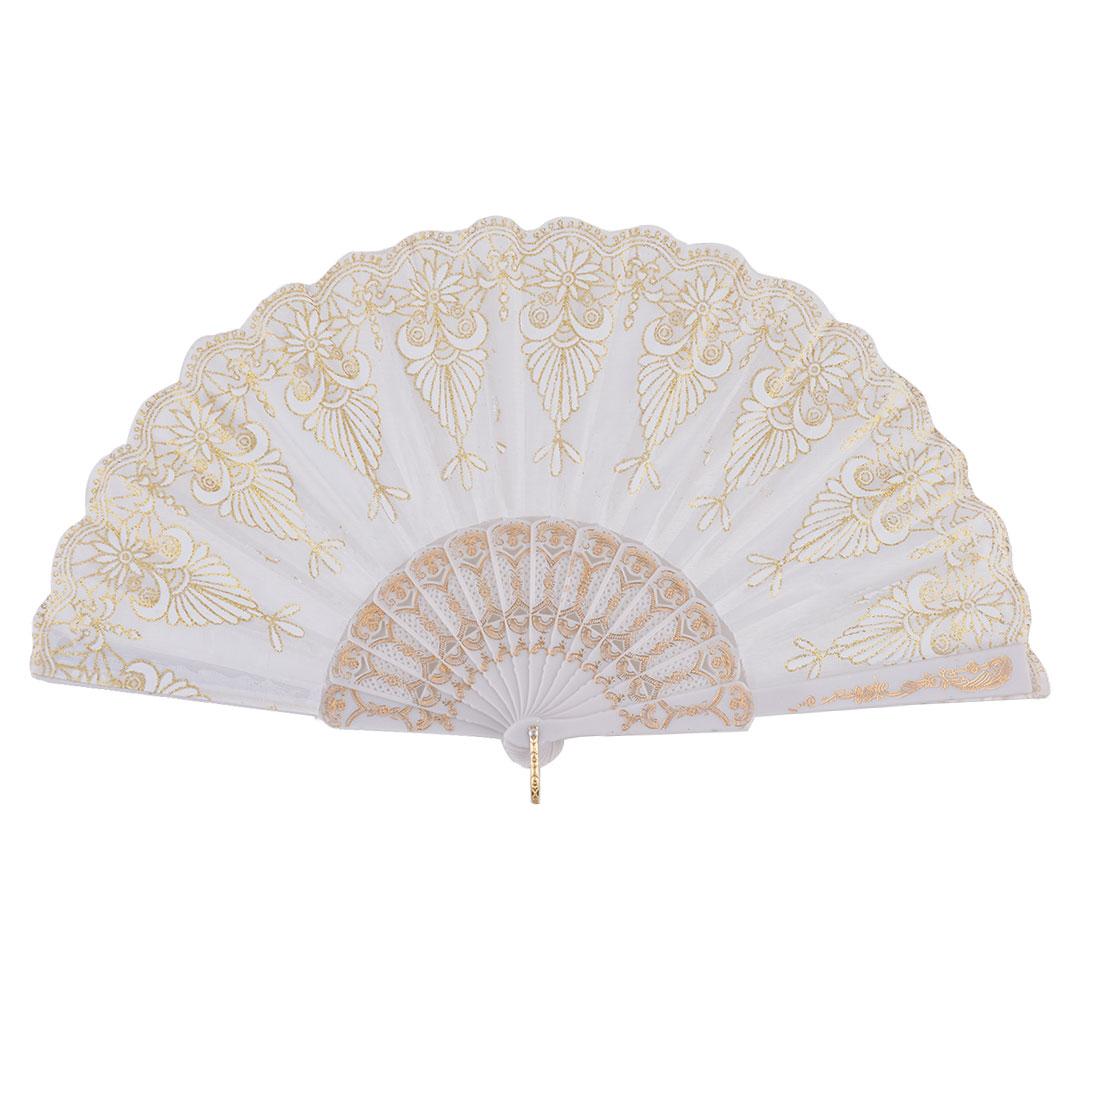 Lady Party Dancing Flower Pattern Powder Detail Exquisited Handy Folding Fan